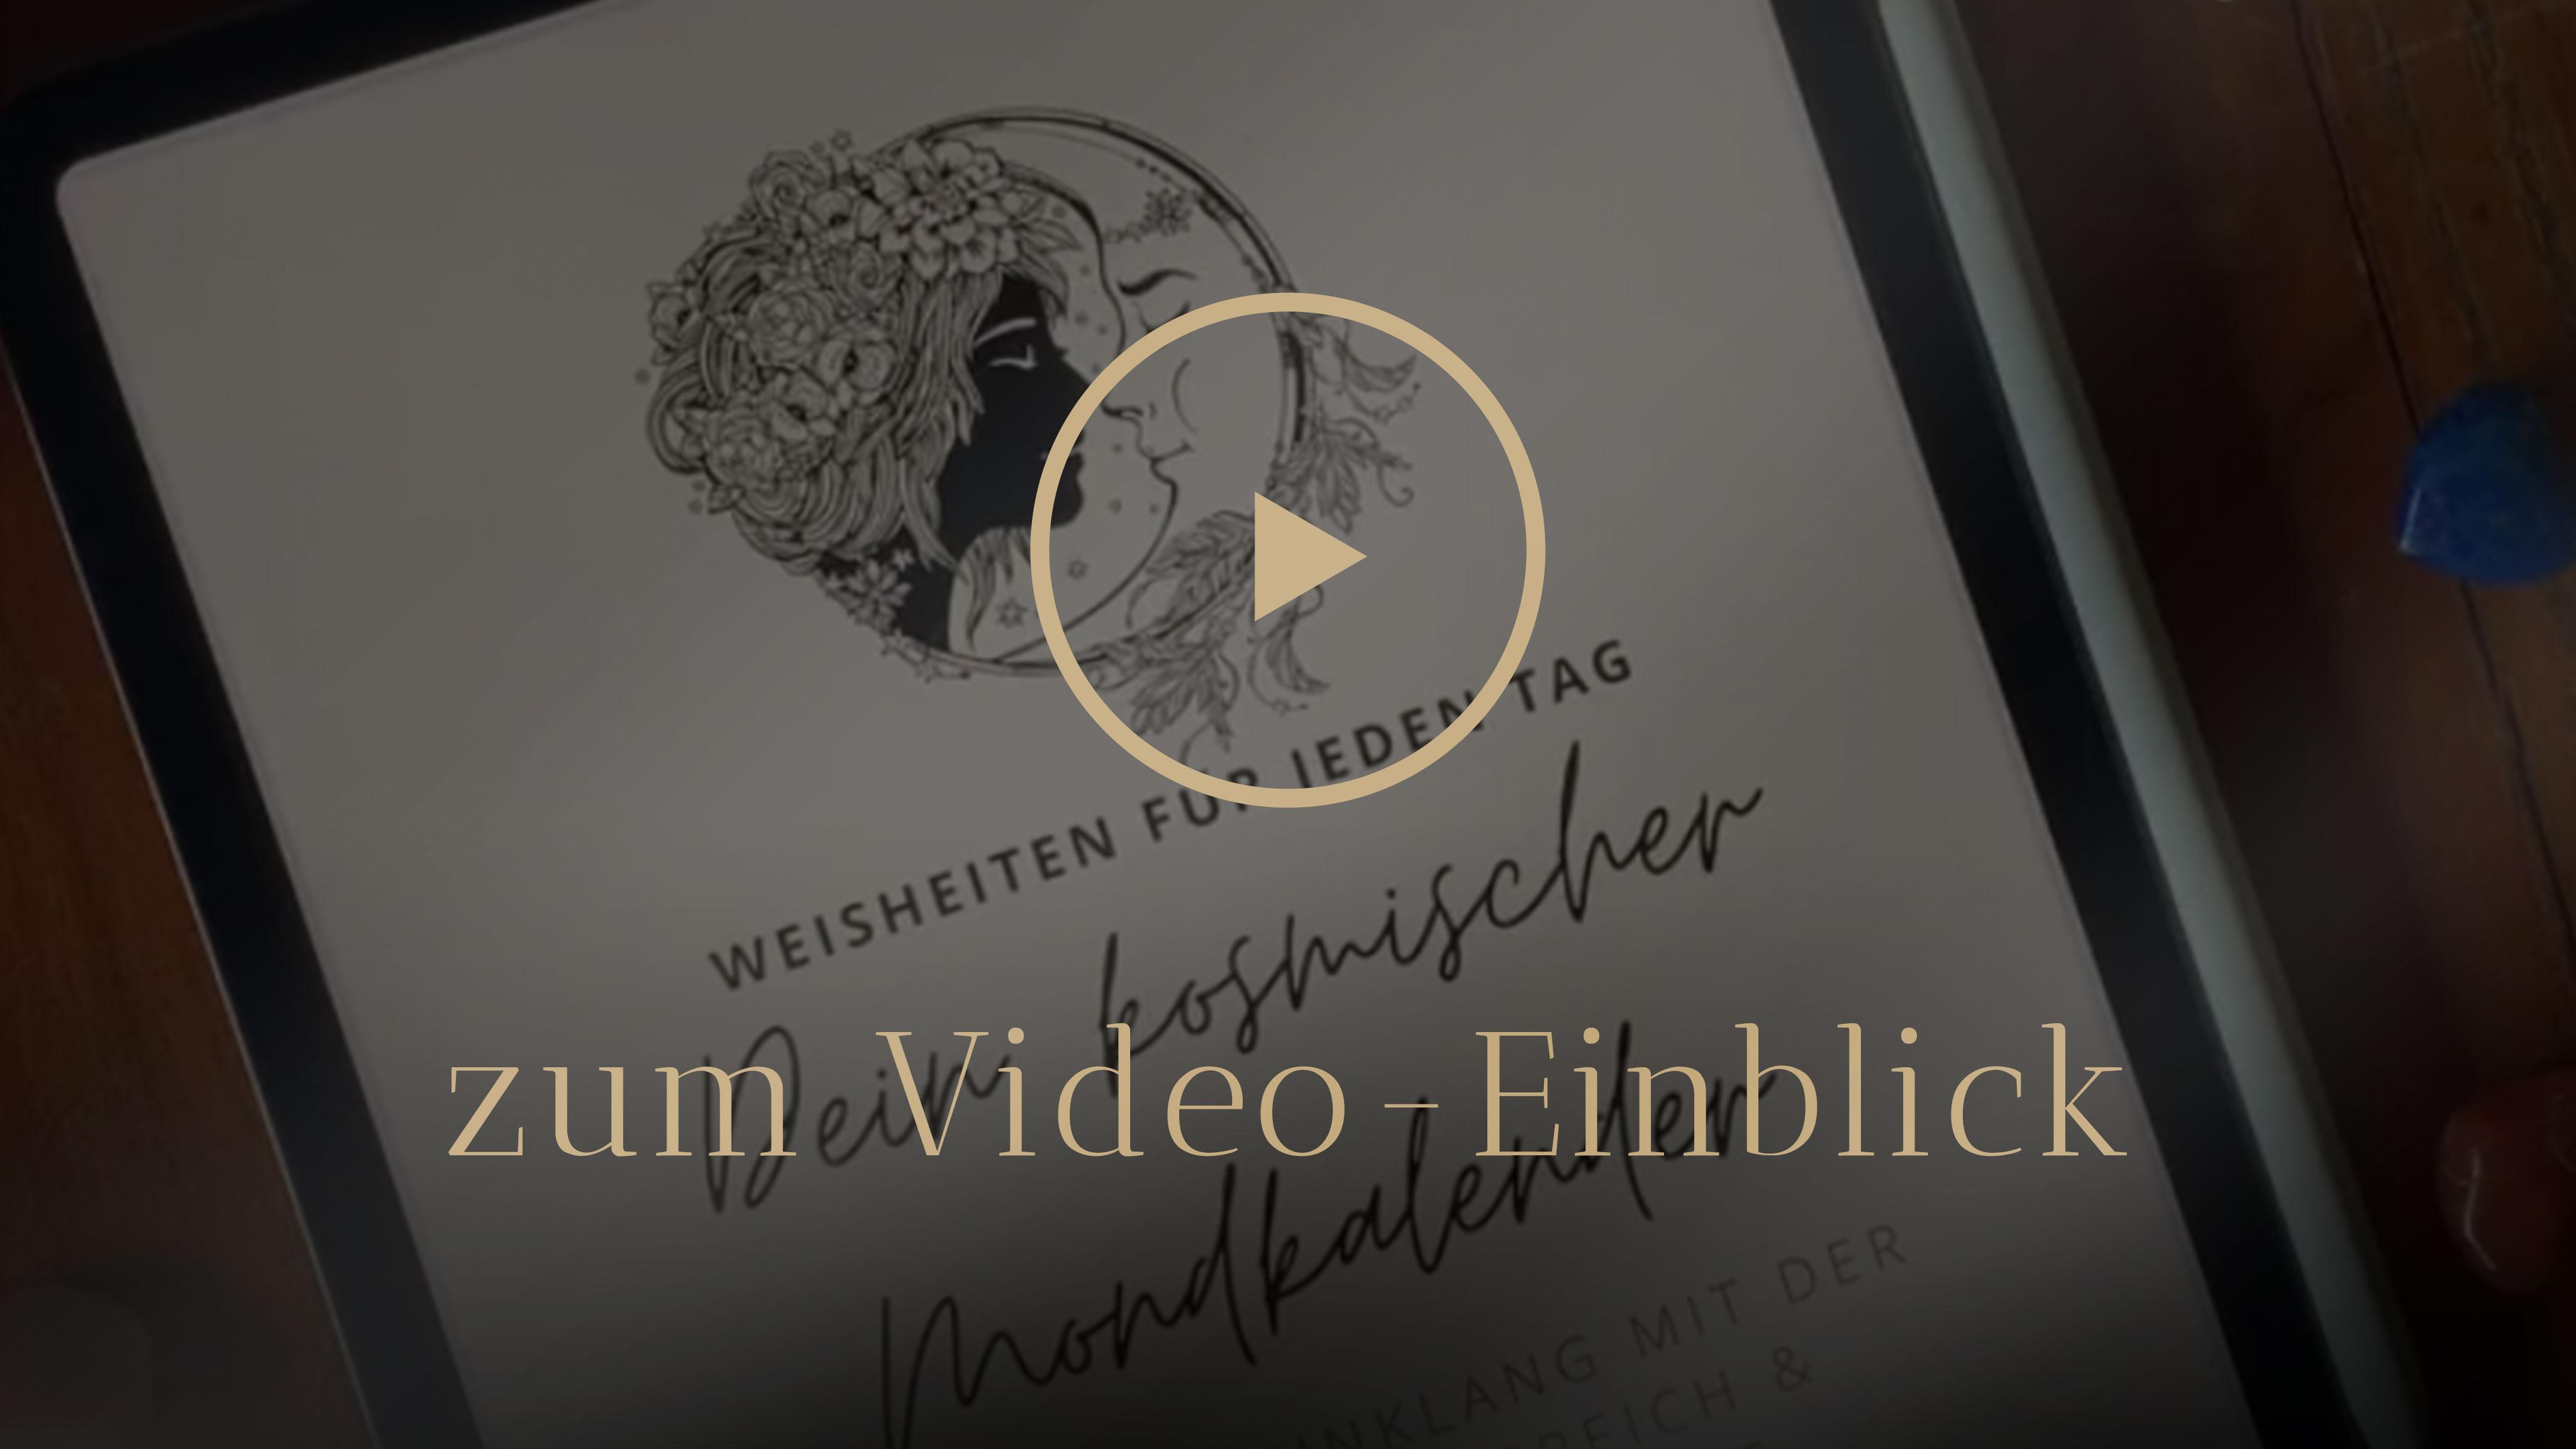 Selbstentdeckung Human Design Mondwissen Video Einblick